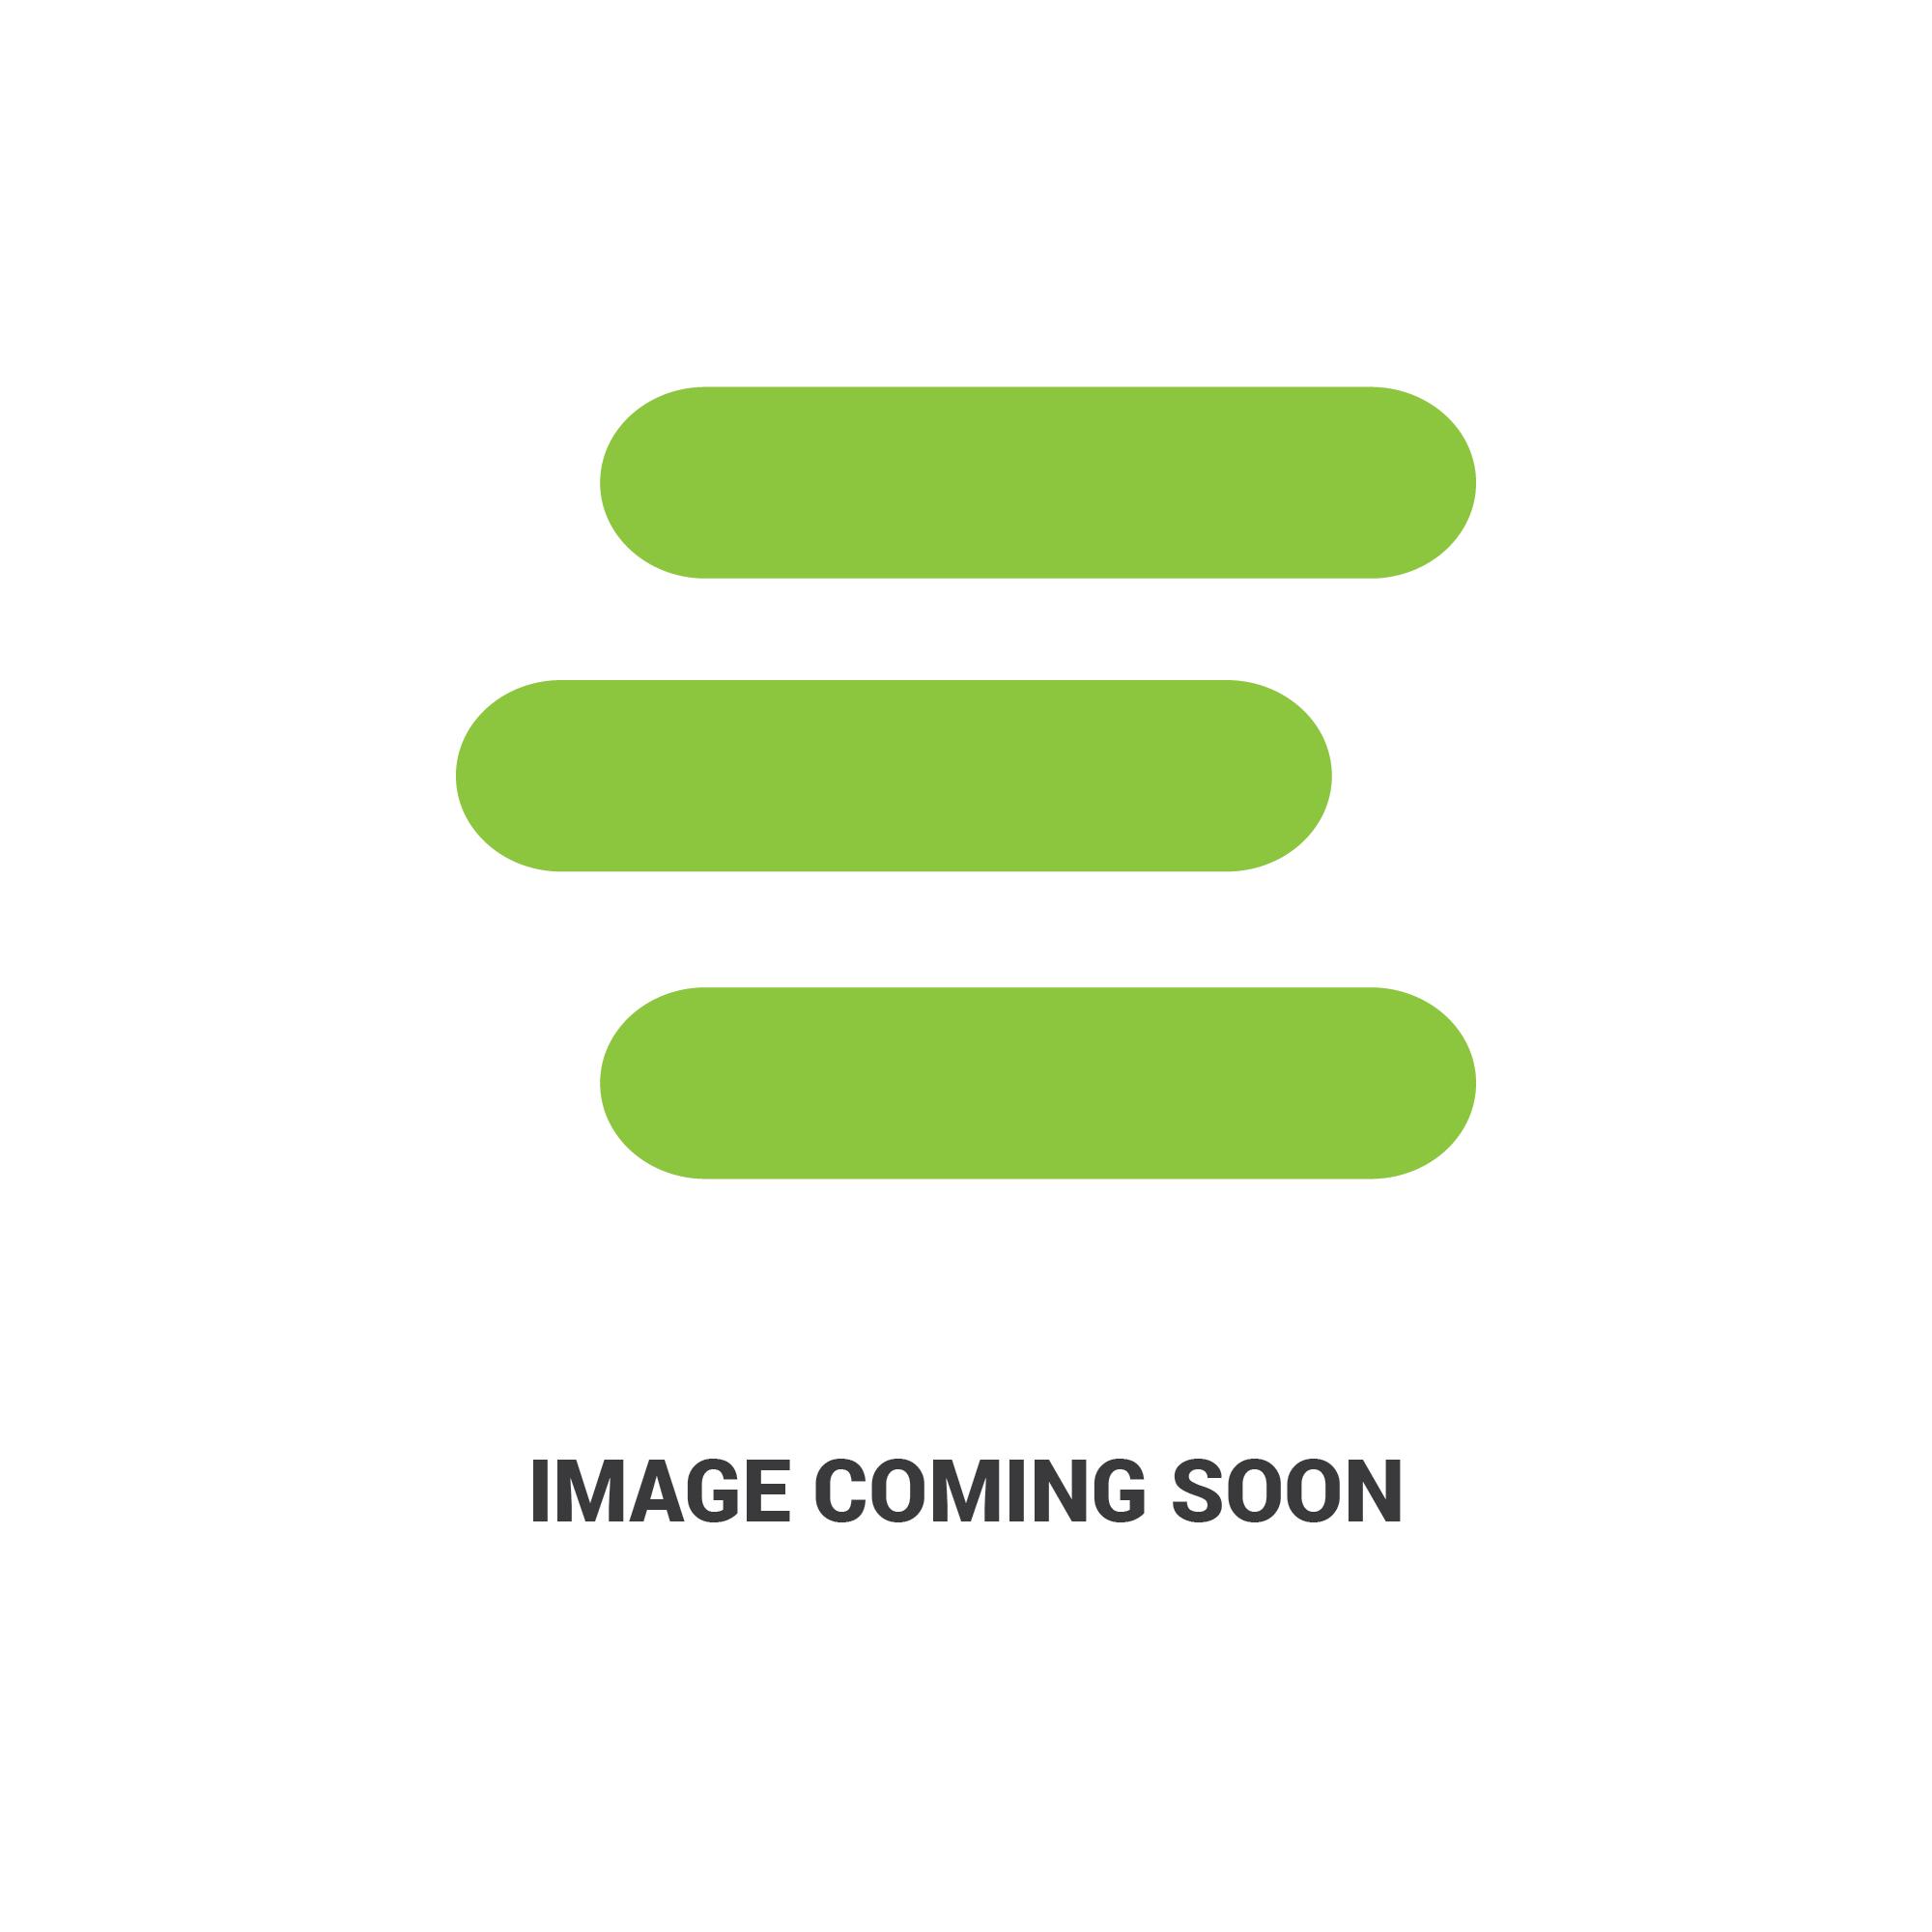 E-4999388edit 1.jpg